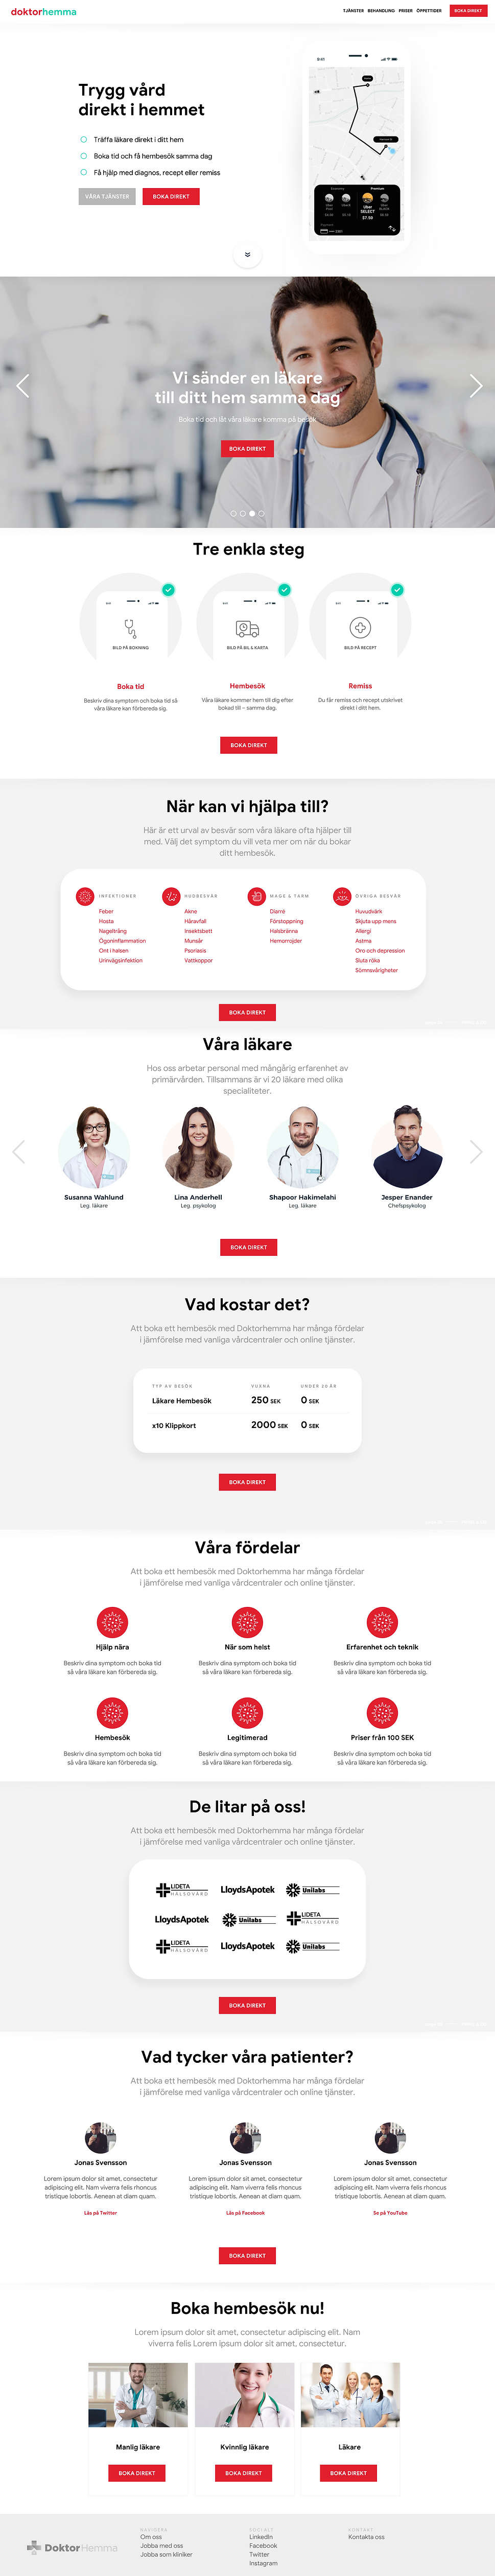 doktorhemma-user-experience.png